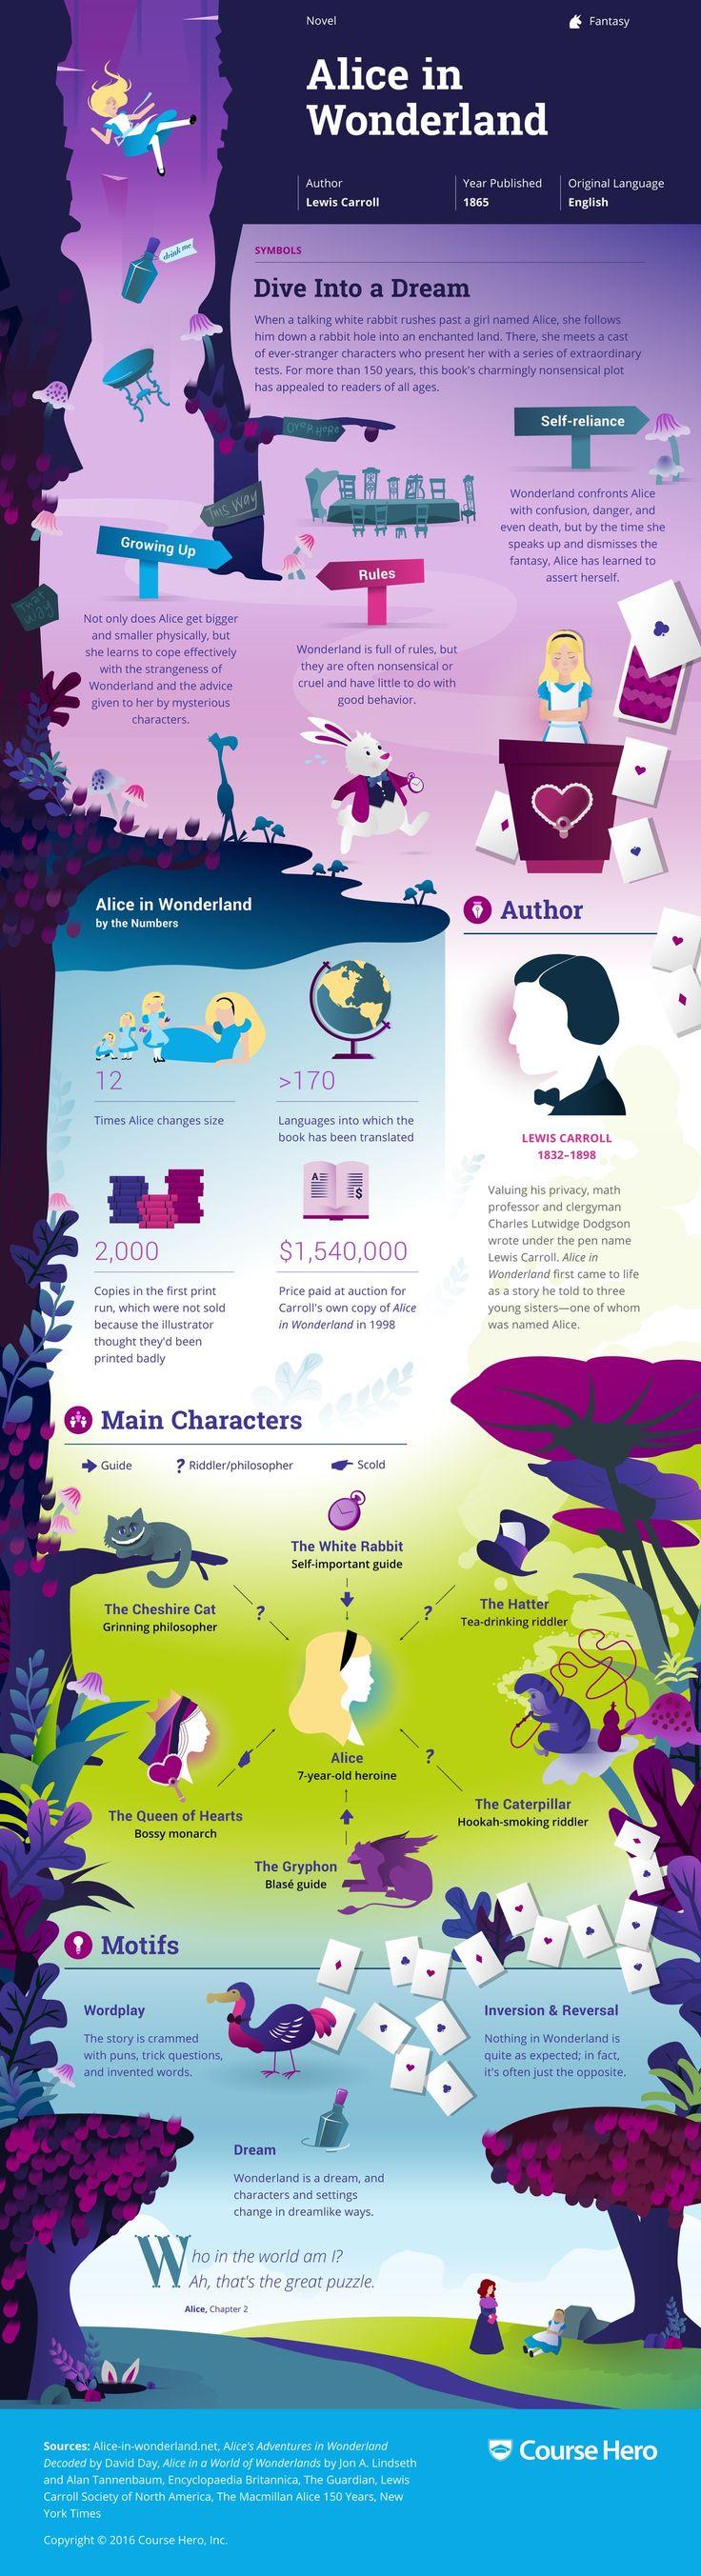 Alice in Wonderland Infographic | Course Hero